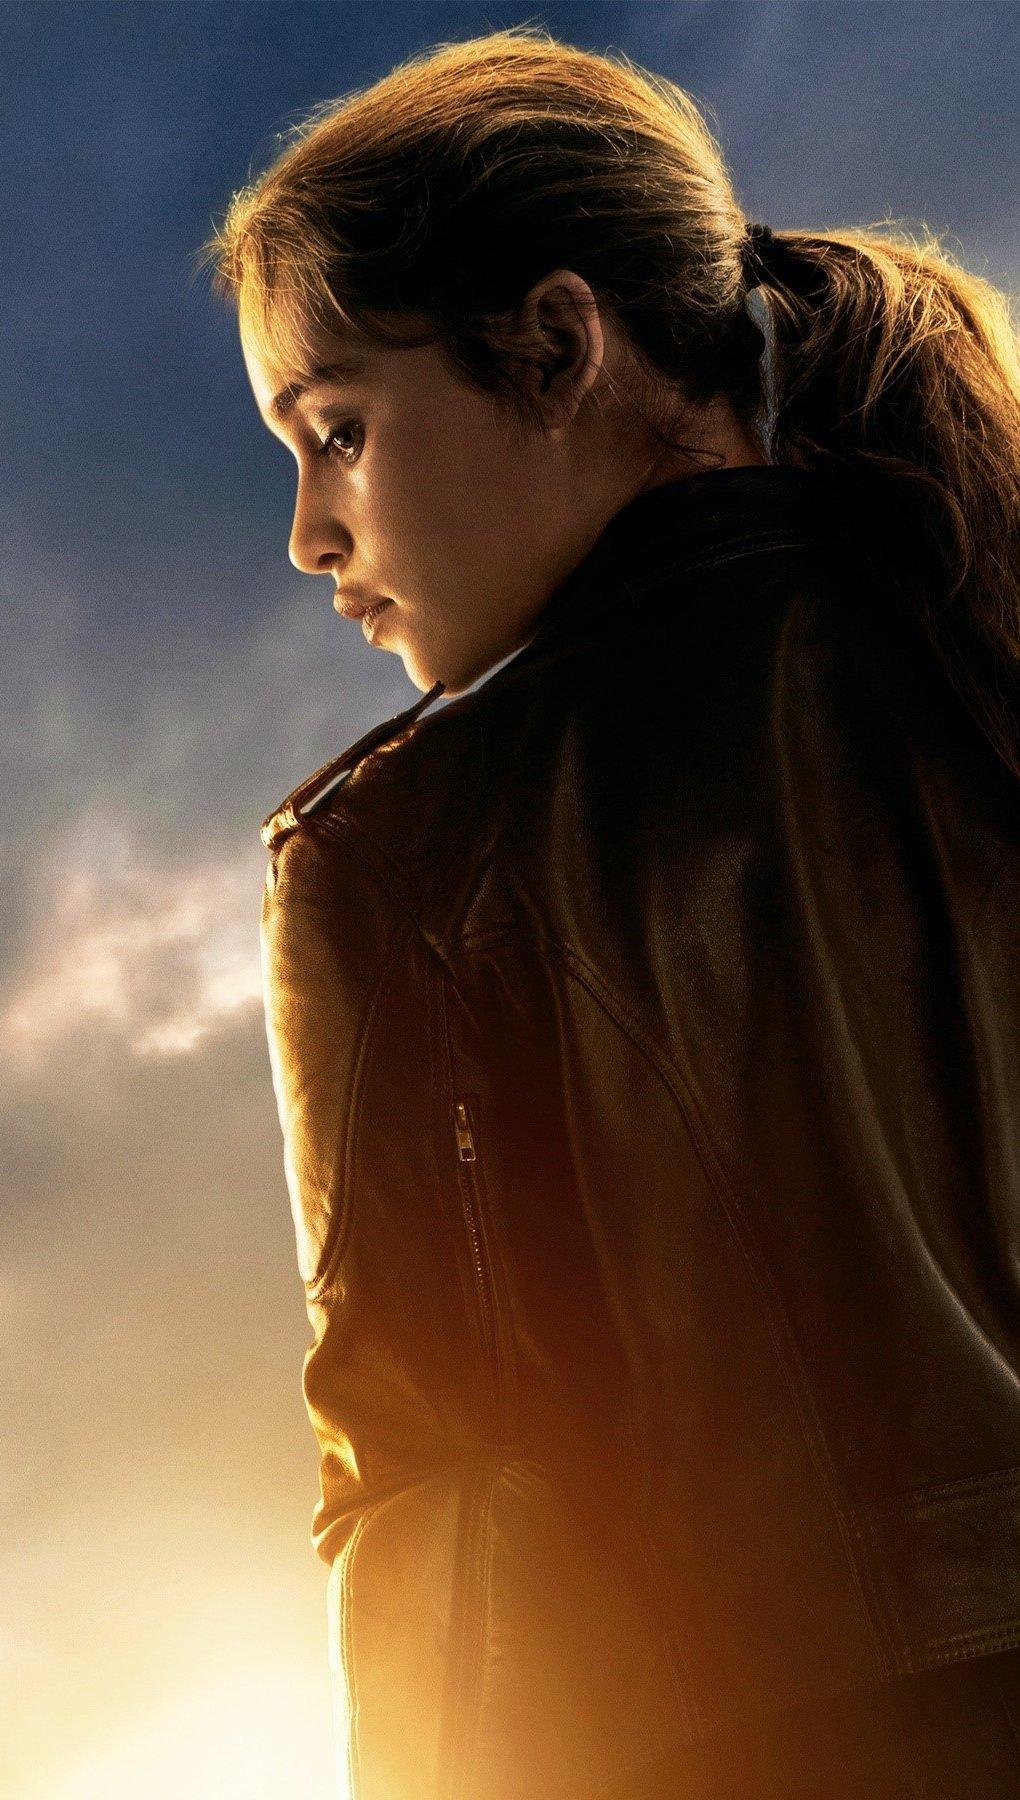 Wallpaper Emilia Clarke in Terminator Genesis Vertical